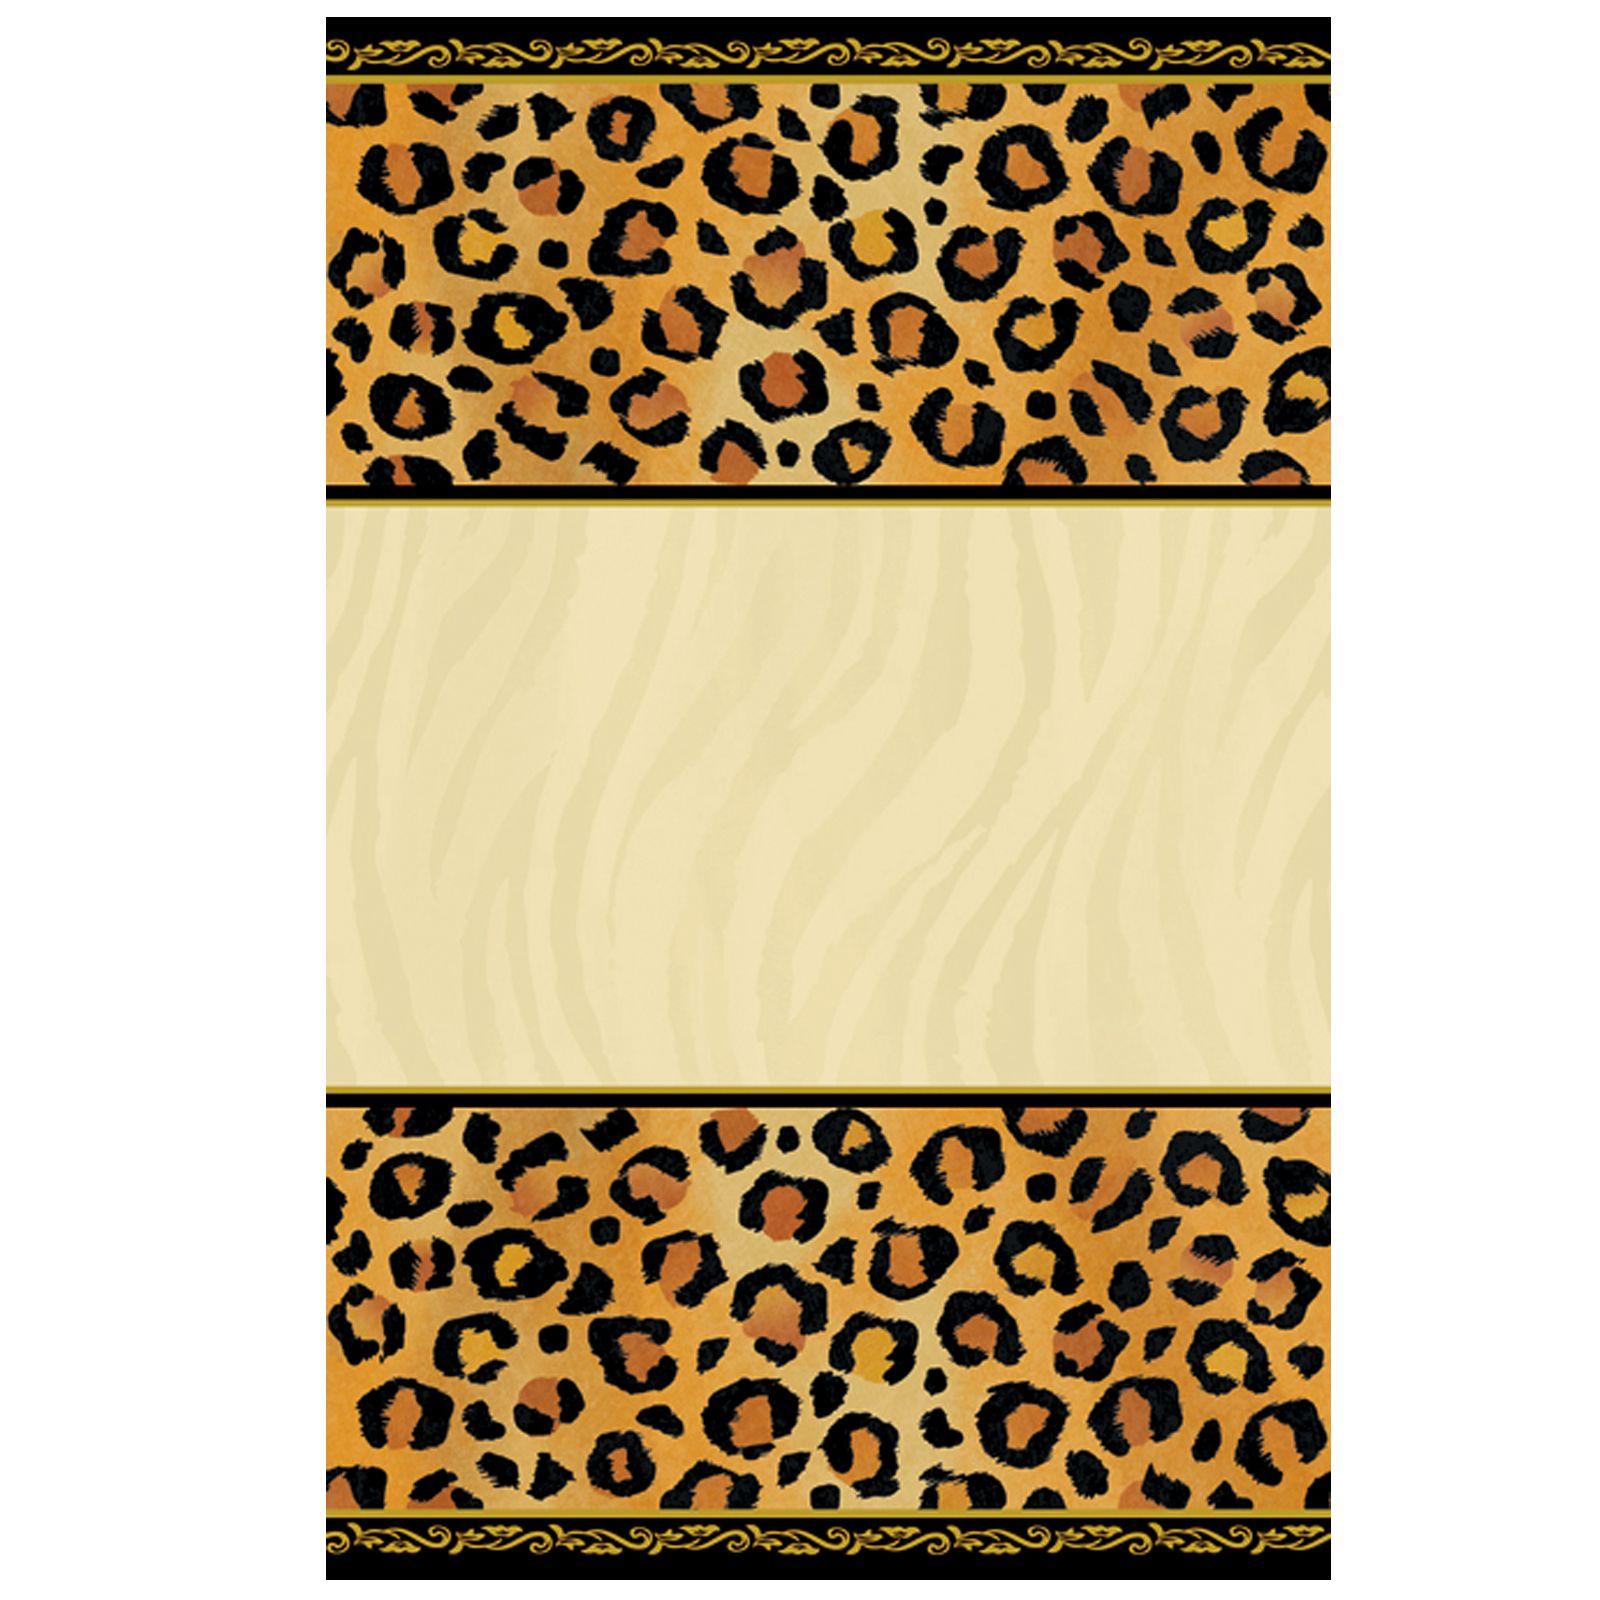 Leopard Print Invitations Printable Free Cakepins